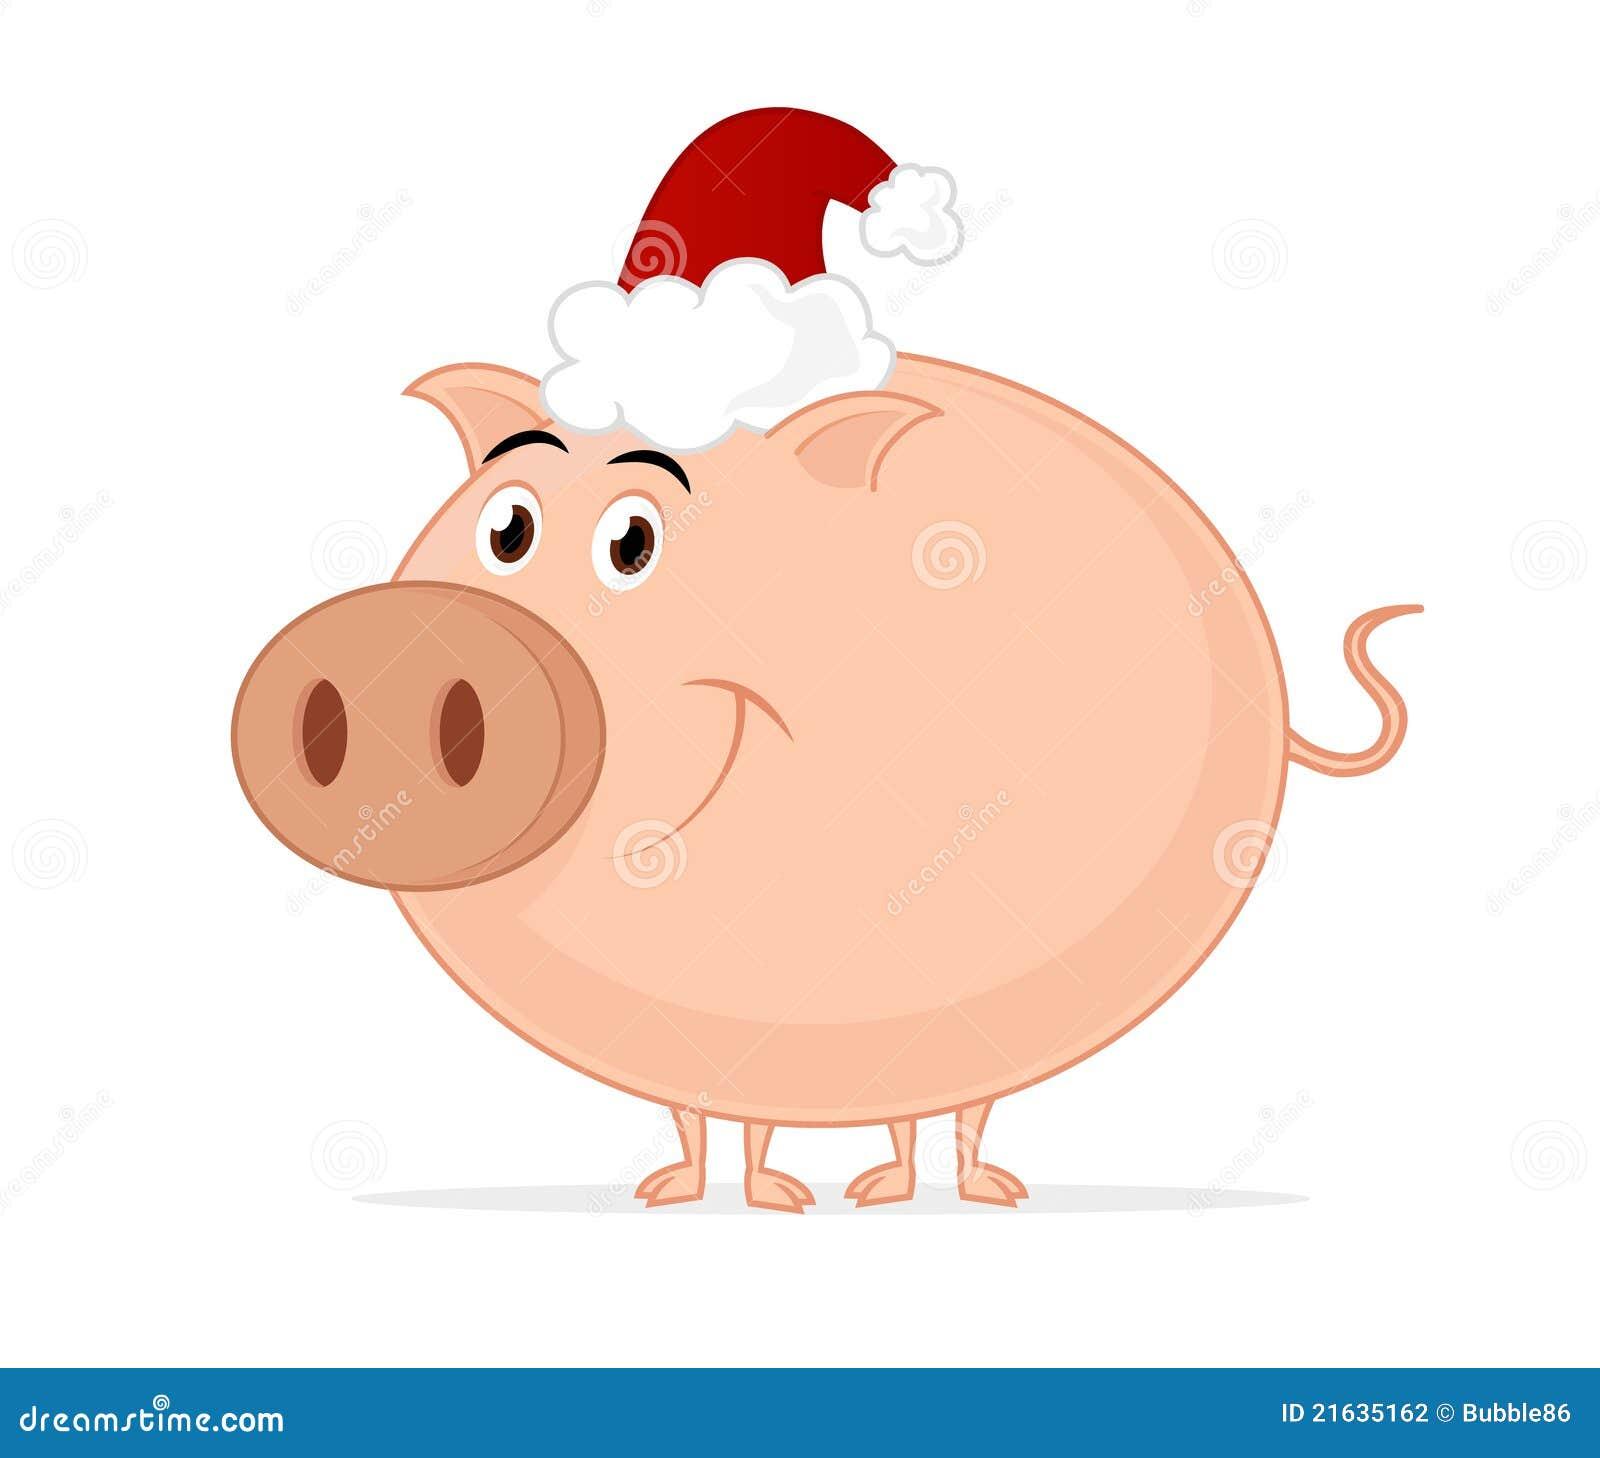 Christmas Pig.Christmas Pig Stock Illustration Illustration Of Cartoon